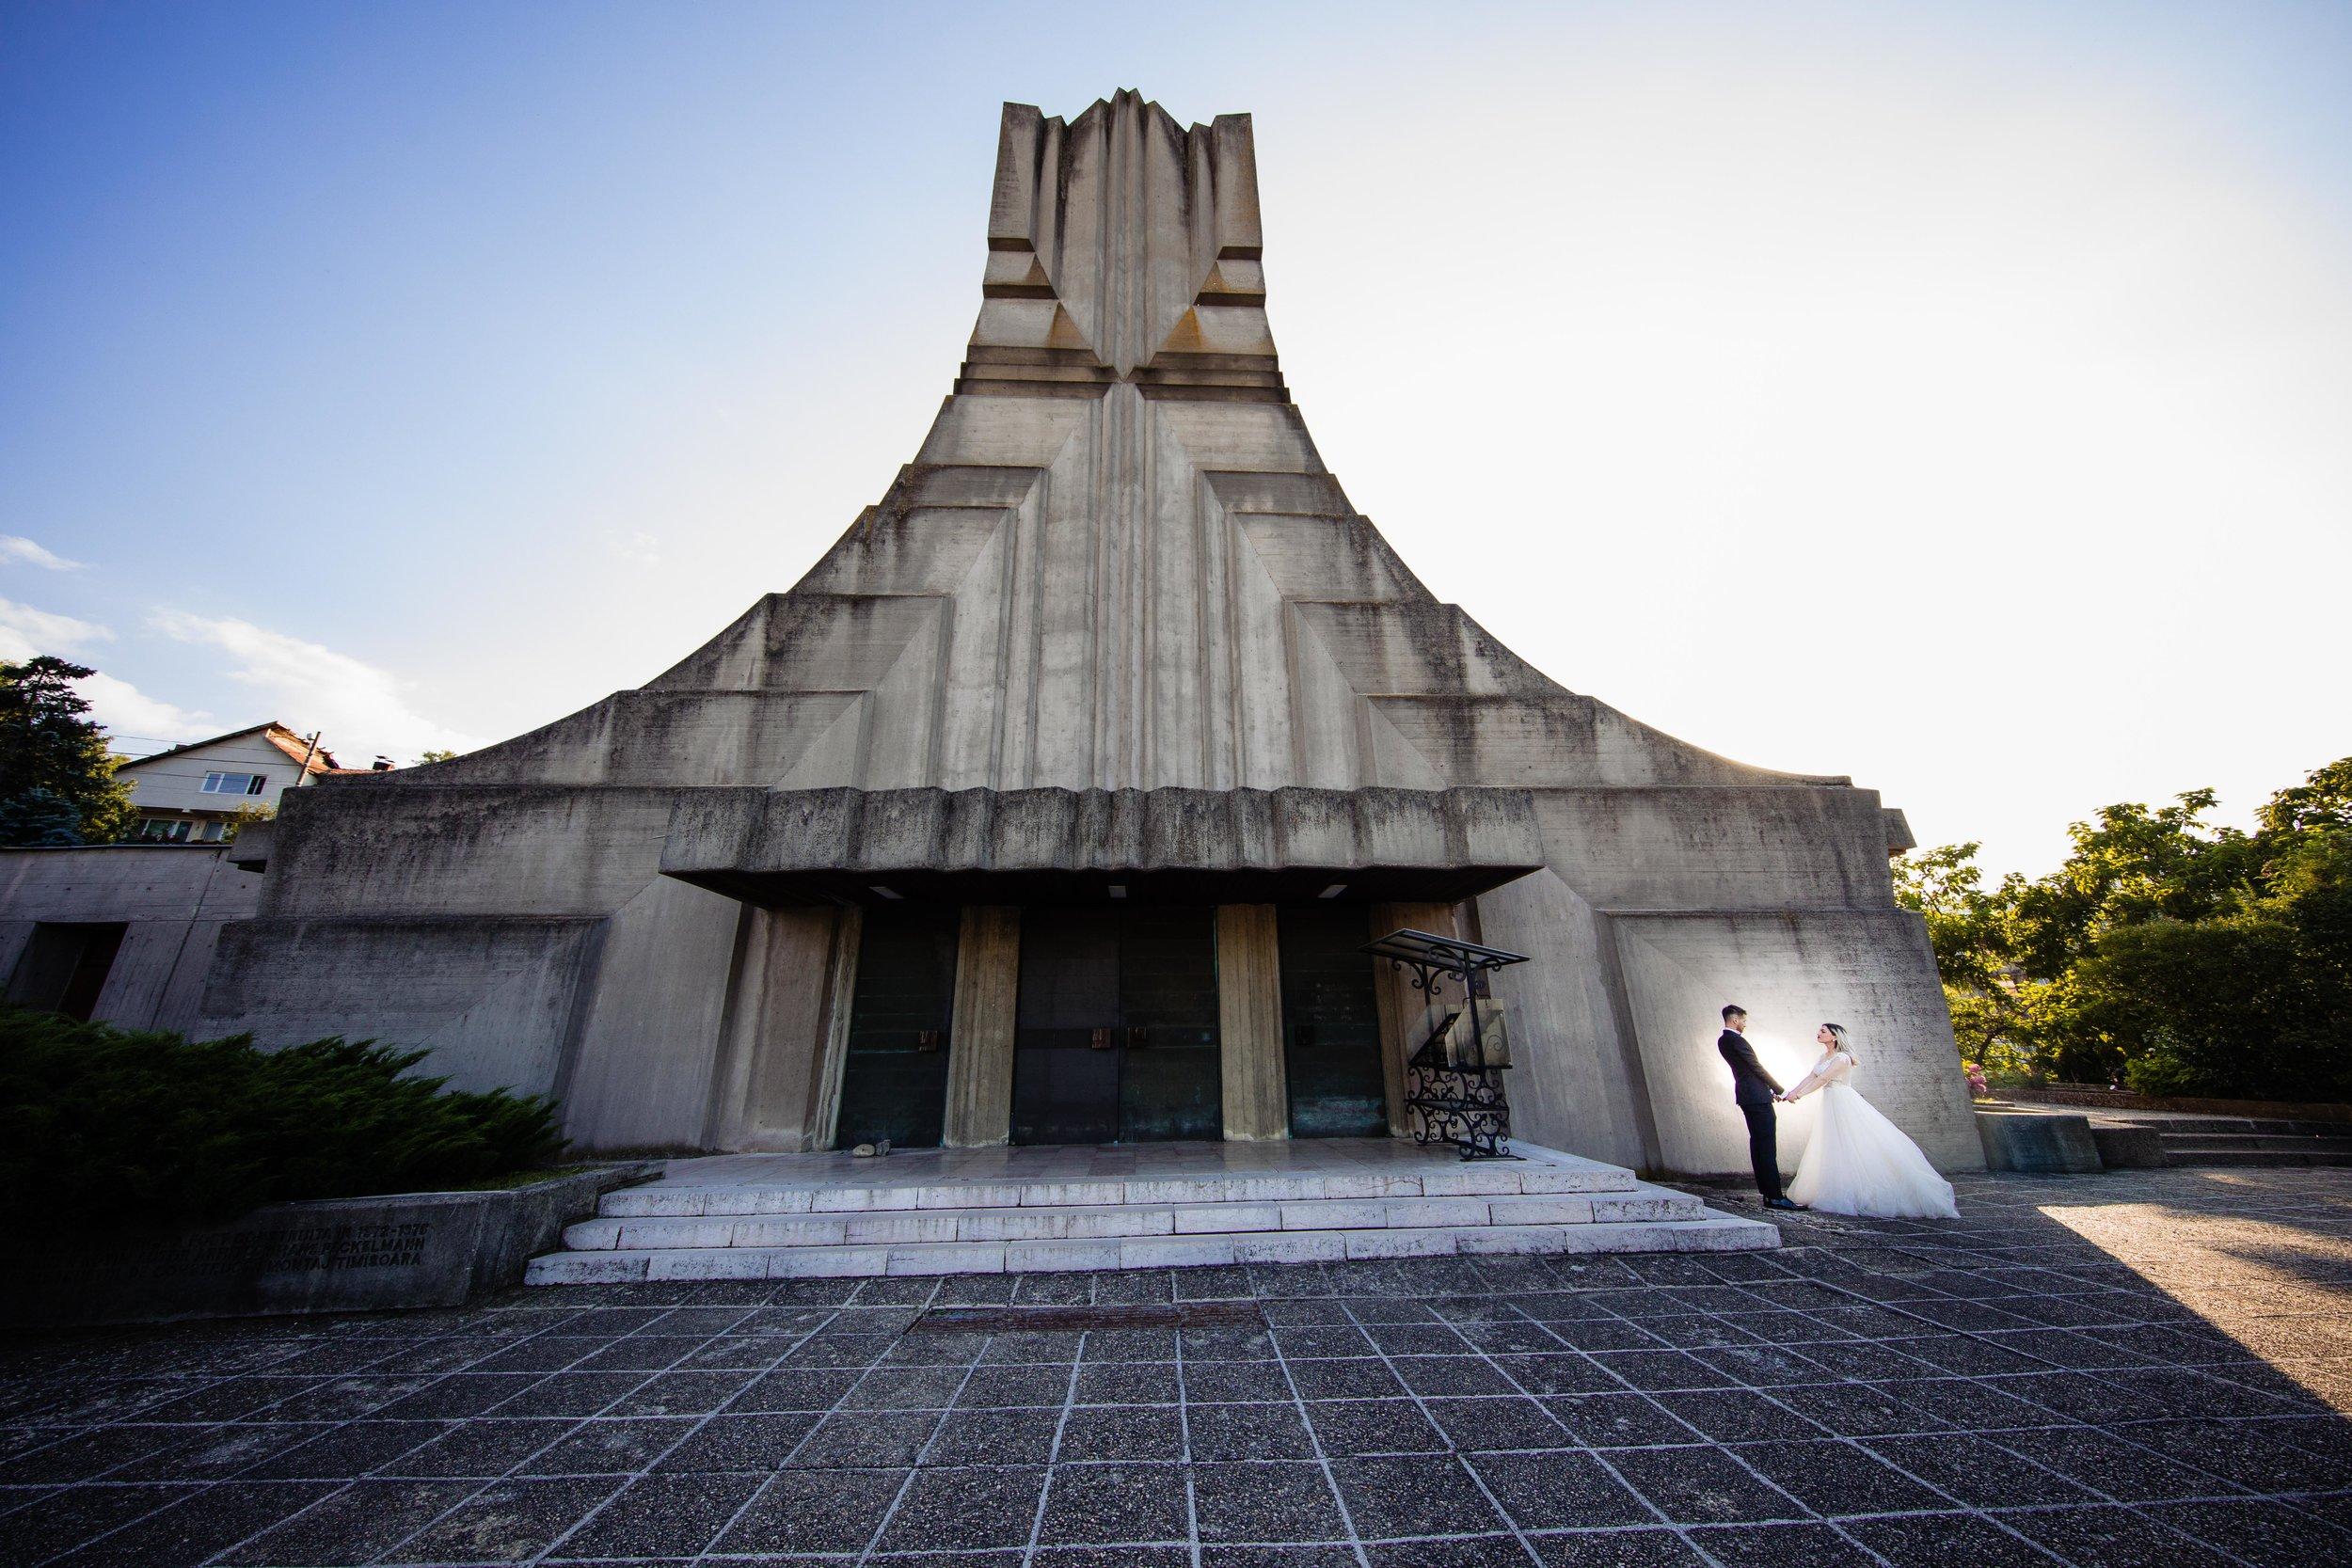 Biserica Romano-Catolică Neprihănita Zămislire